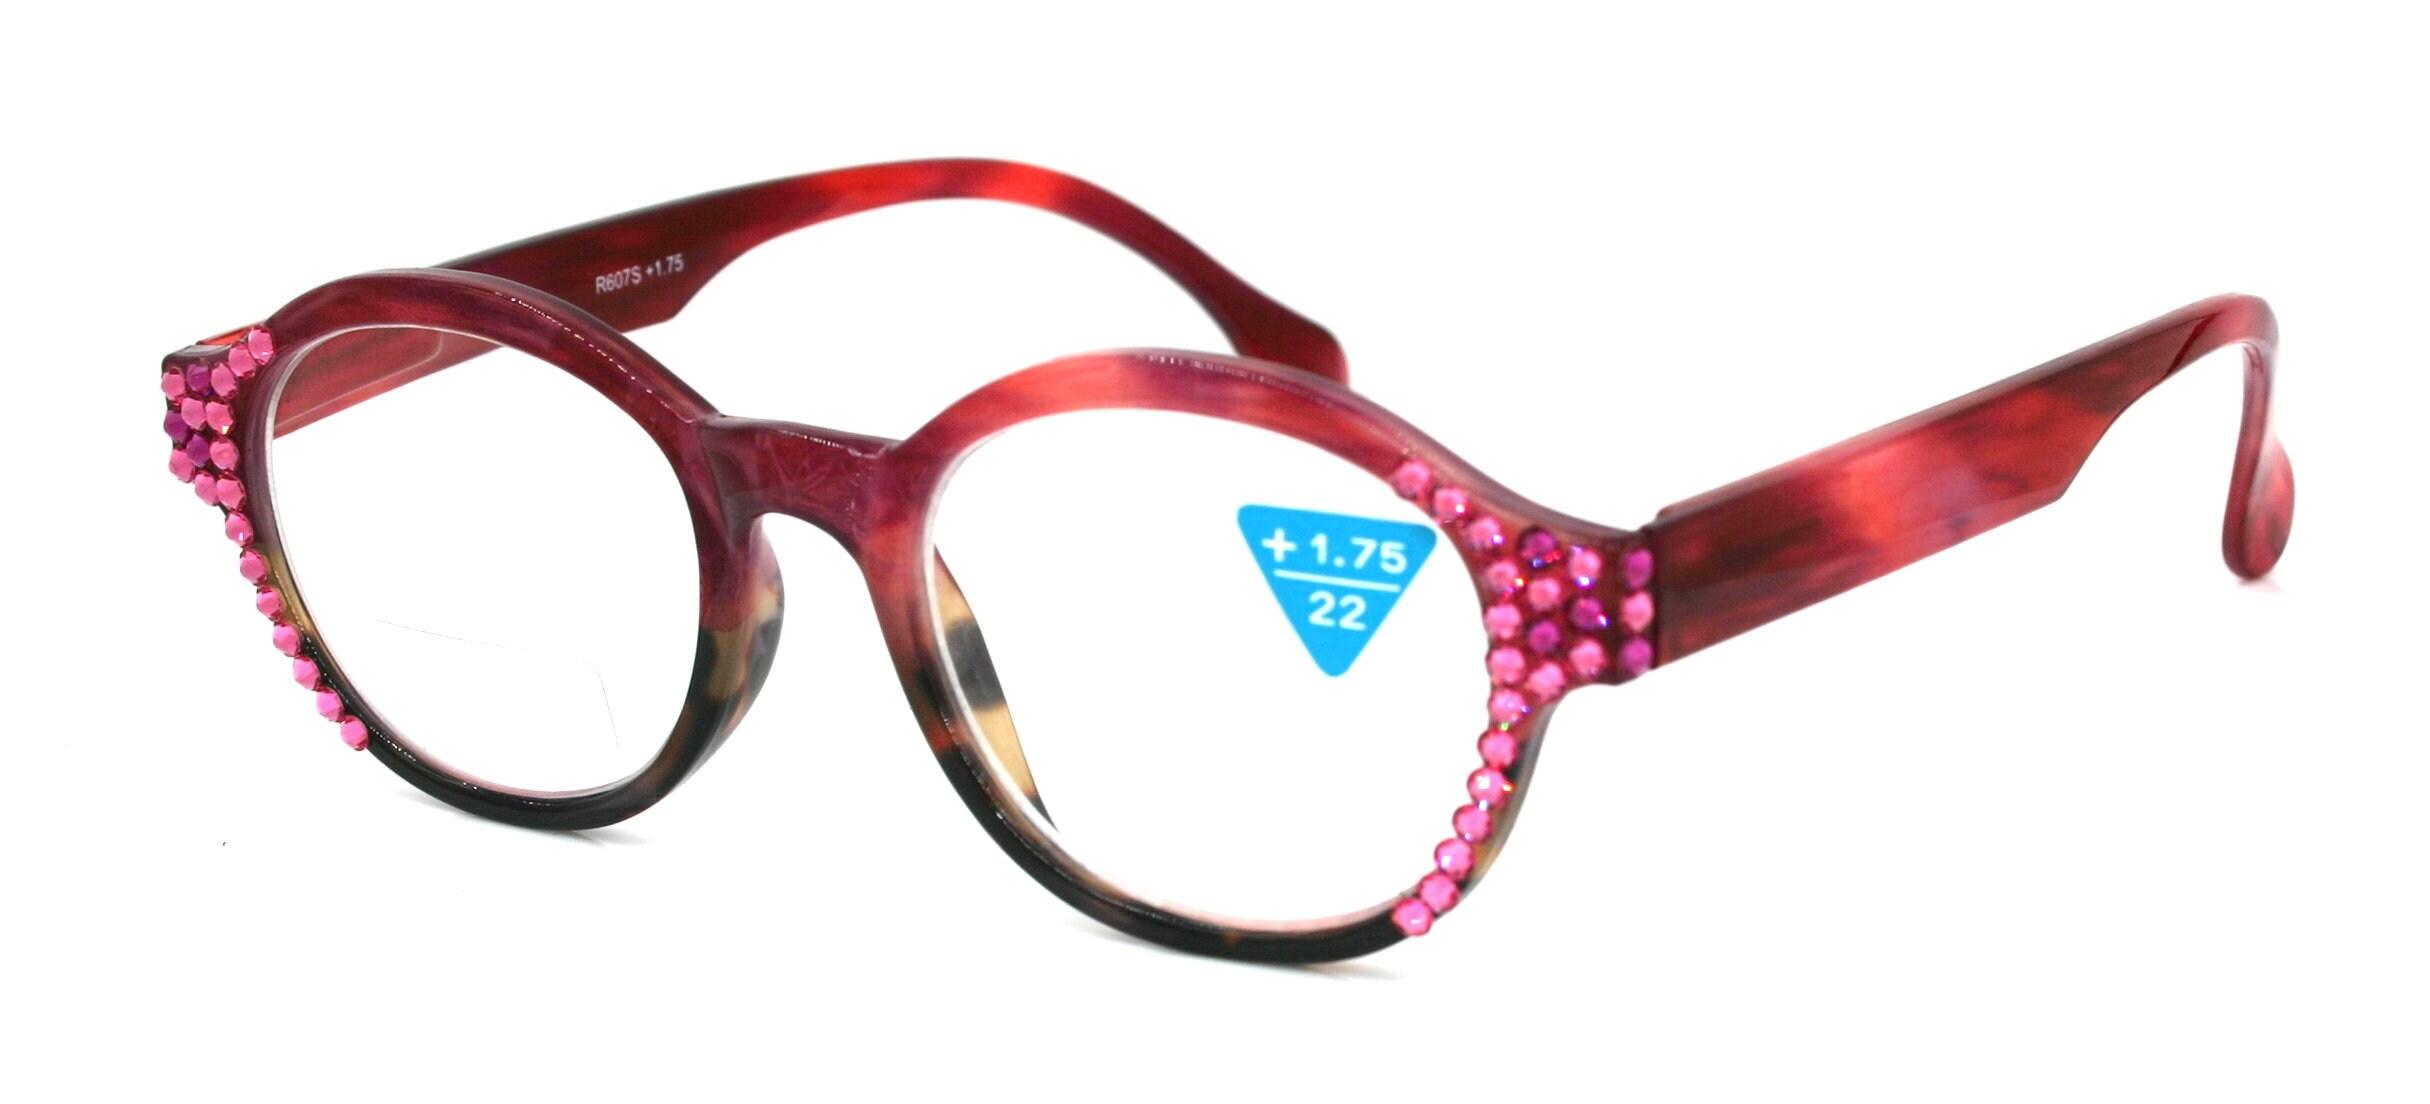 Las gafas de lectura ALCHEMIST Round Women con cristales